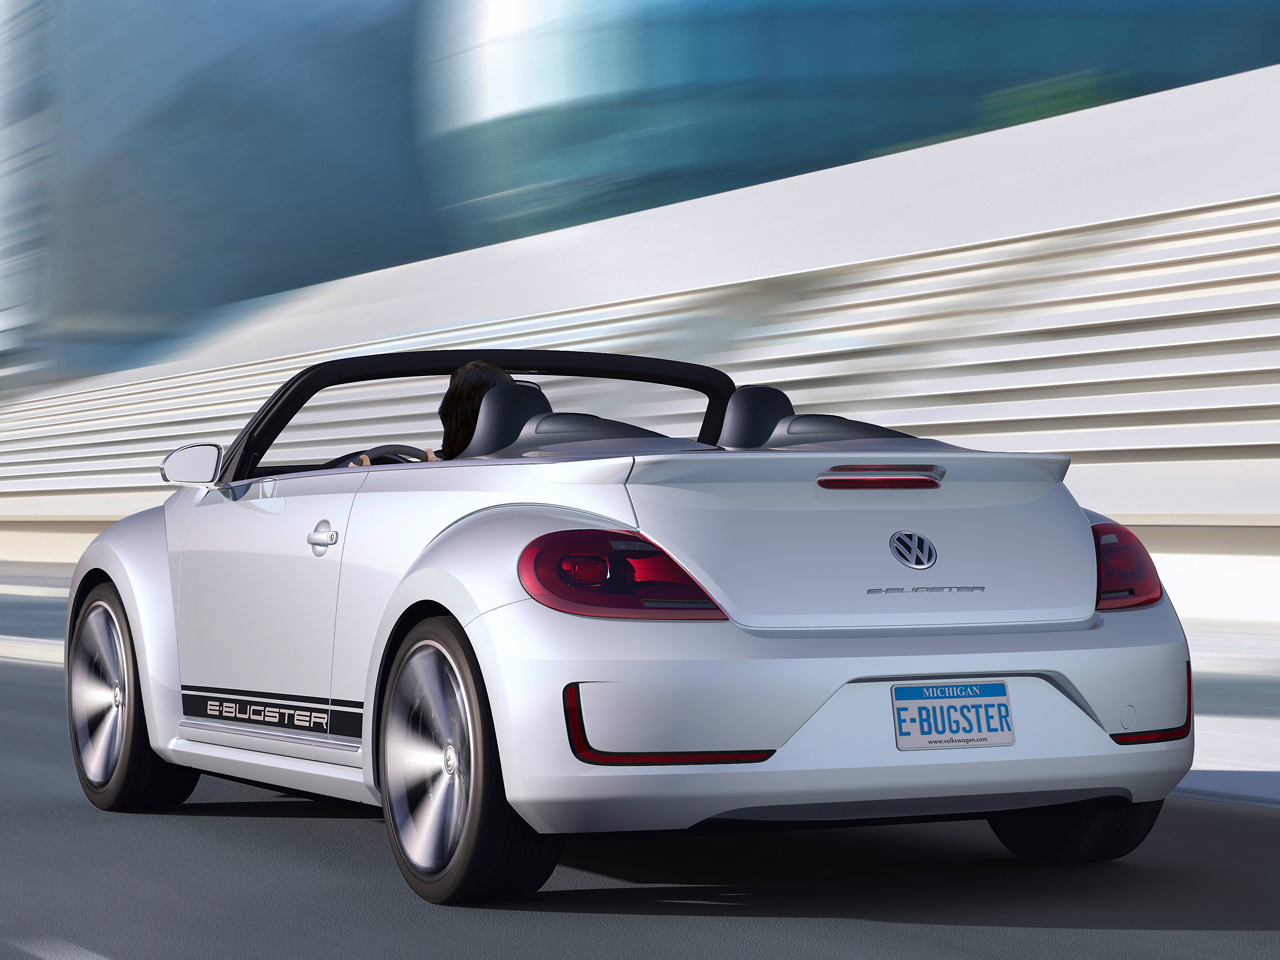 vw beetle cabrio 2012 e bugster als vorschau auf auto china peking. Black Bedroom Furniture Sets. Home Design Ideas